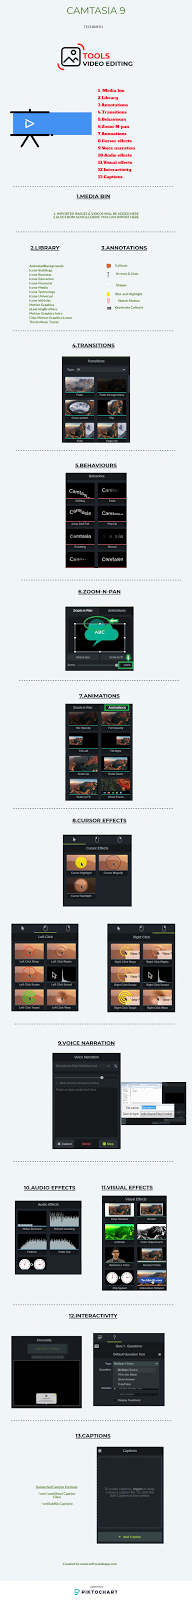 camtasia9-tools-infographics